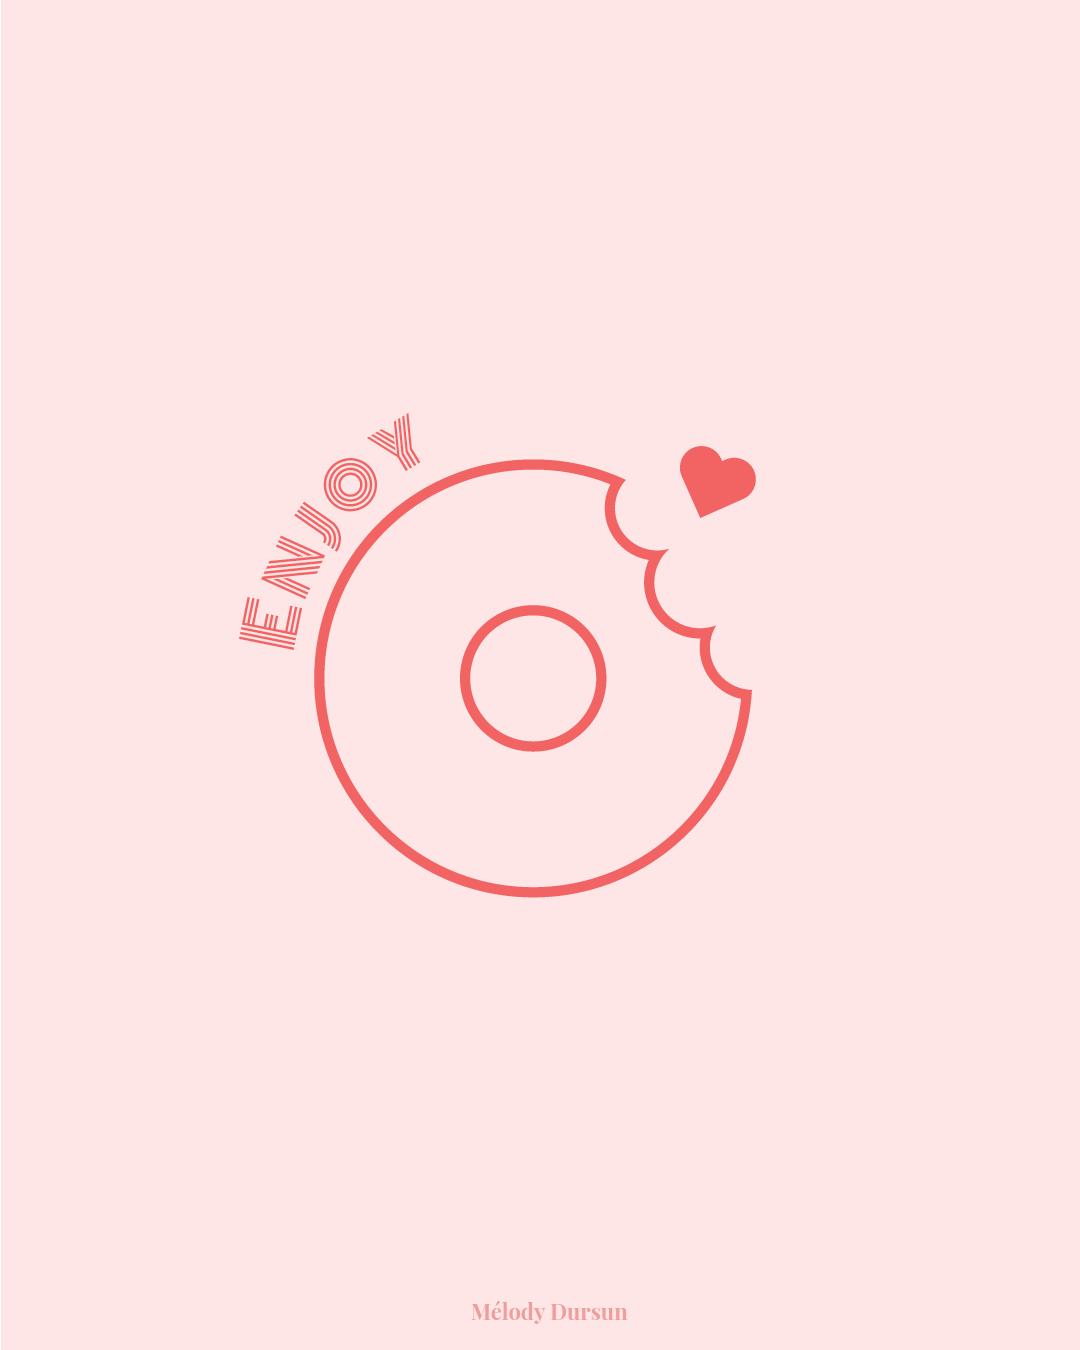 melodydursun-enjoy-donuts